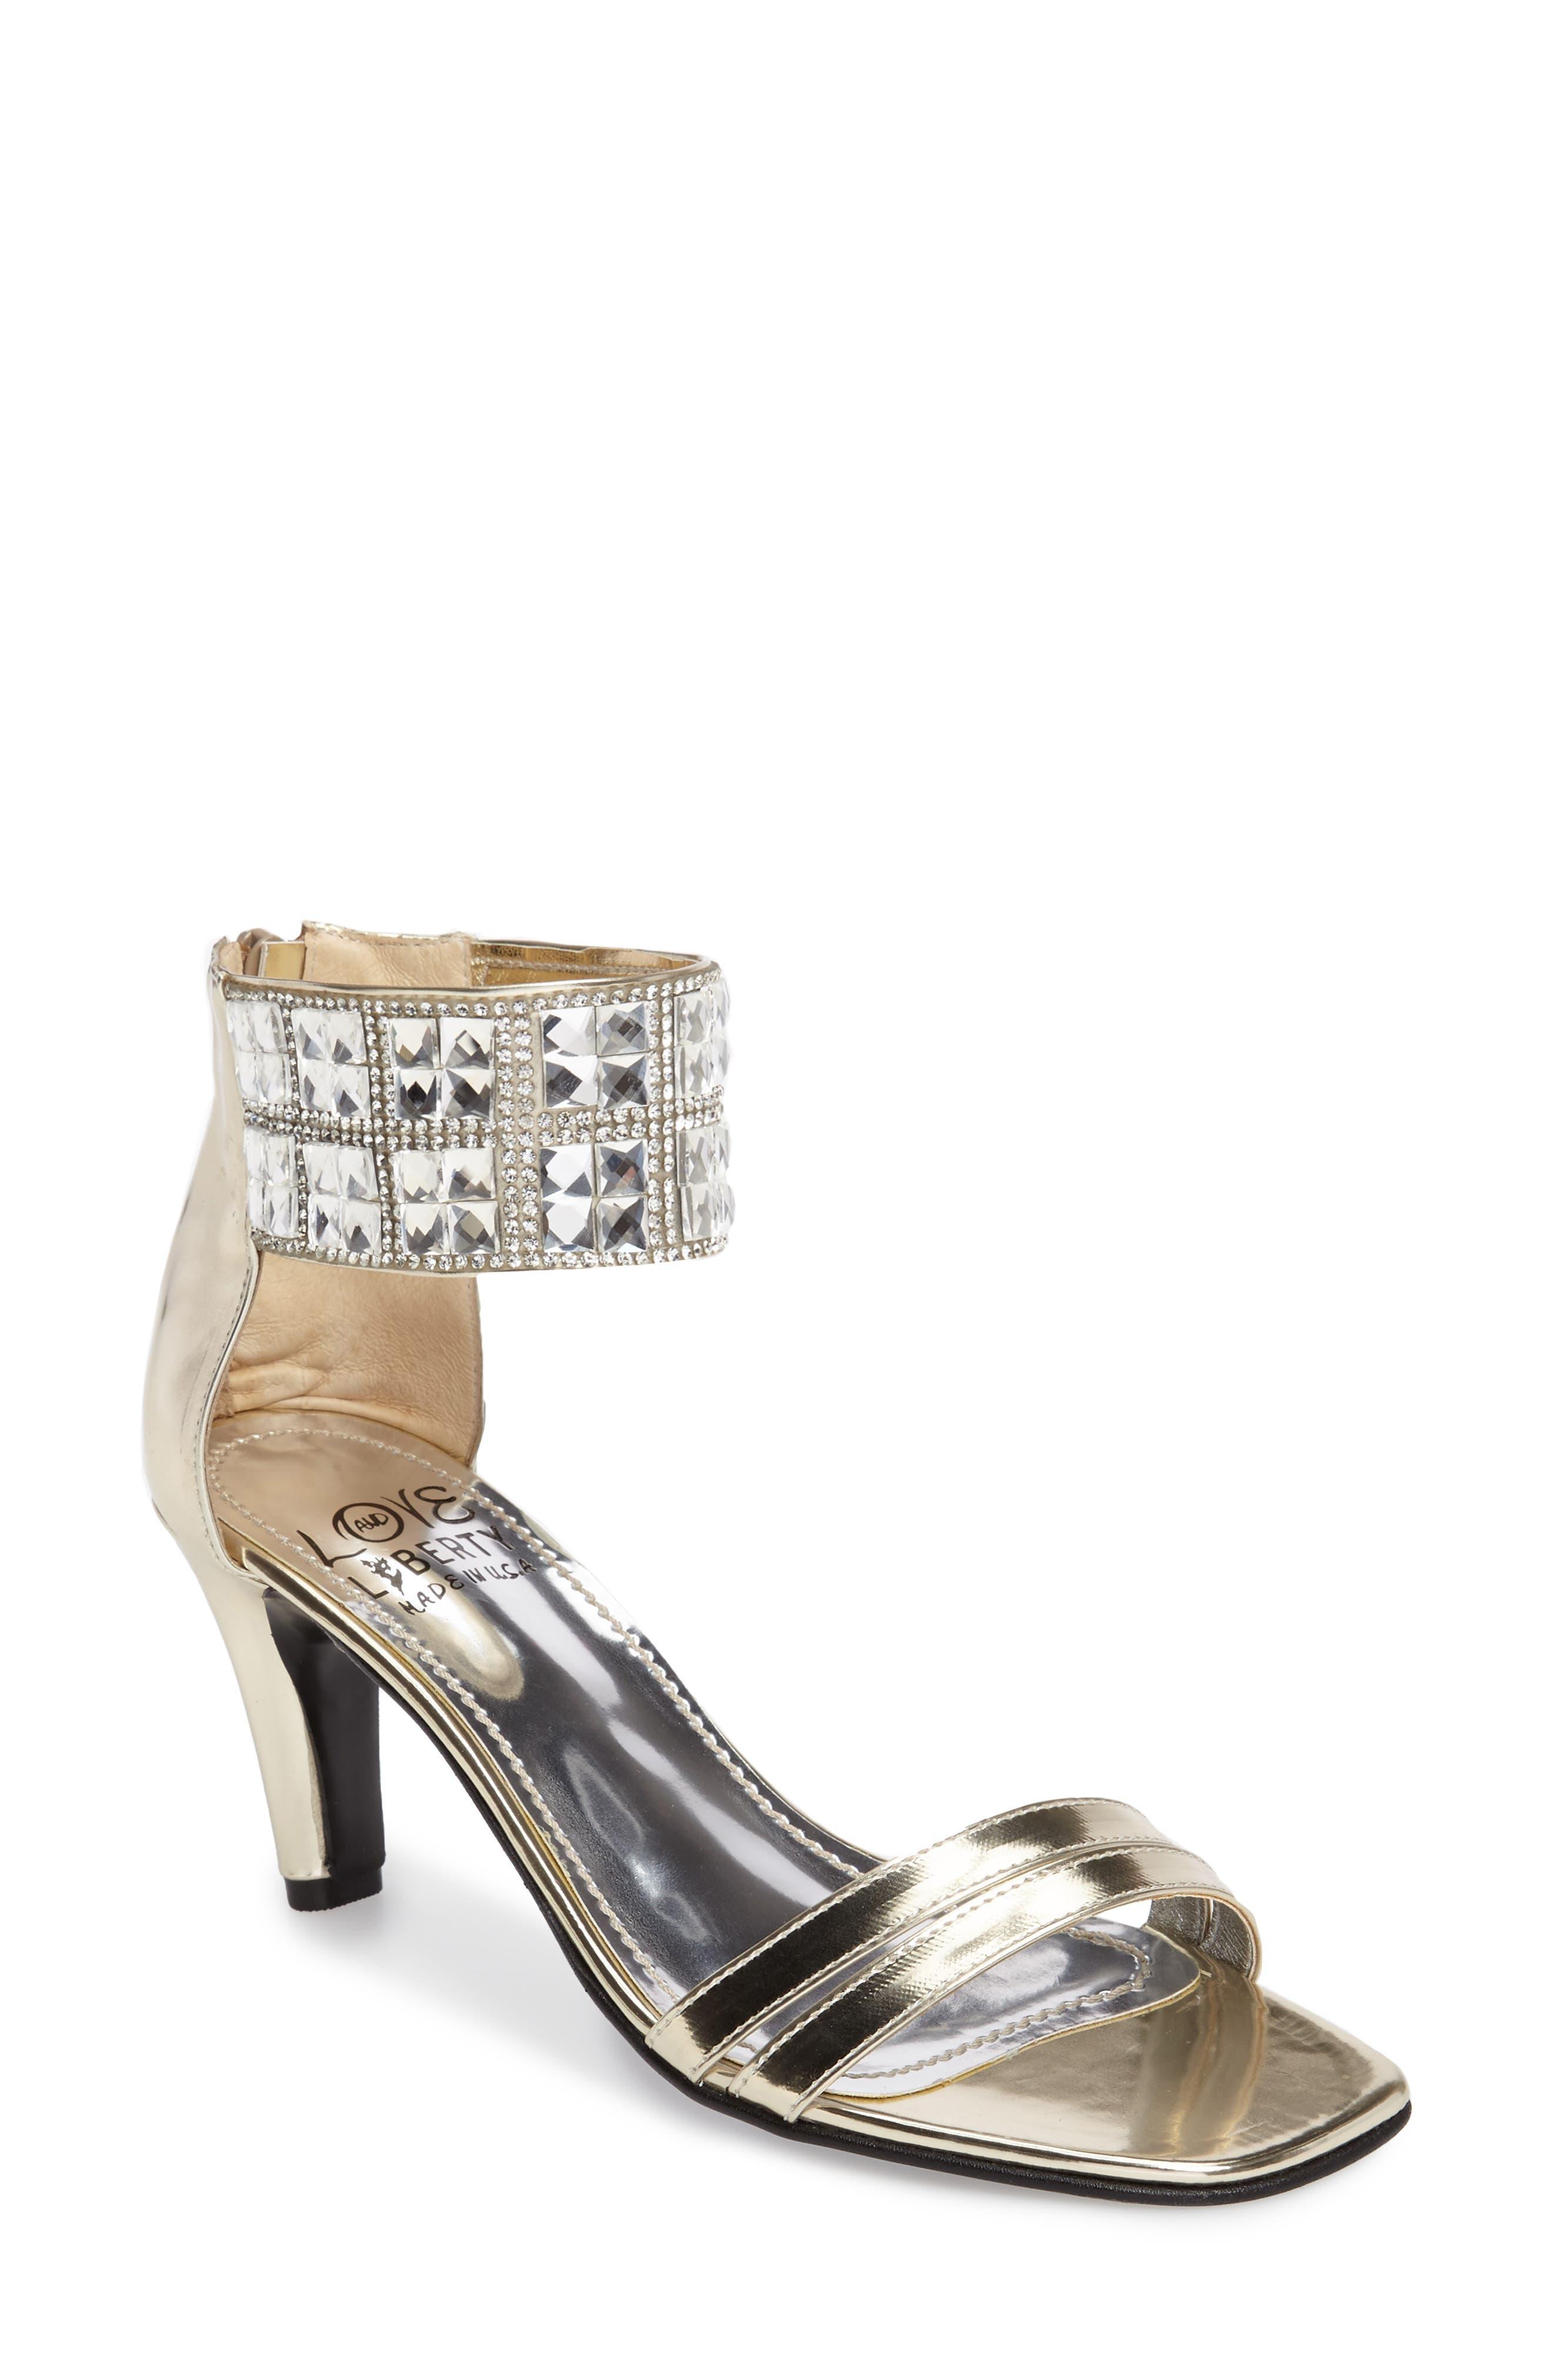 Scarlett Crystal Embellished Evening Sandal,                             Alternate thumbnail 2, color,                             PLATINUM FAUX LEATHER